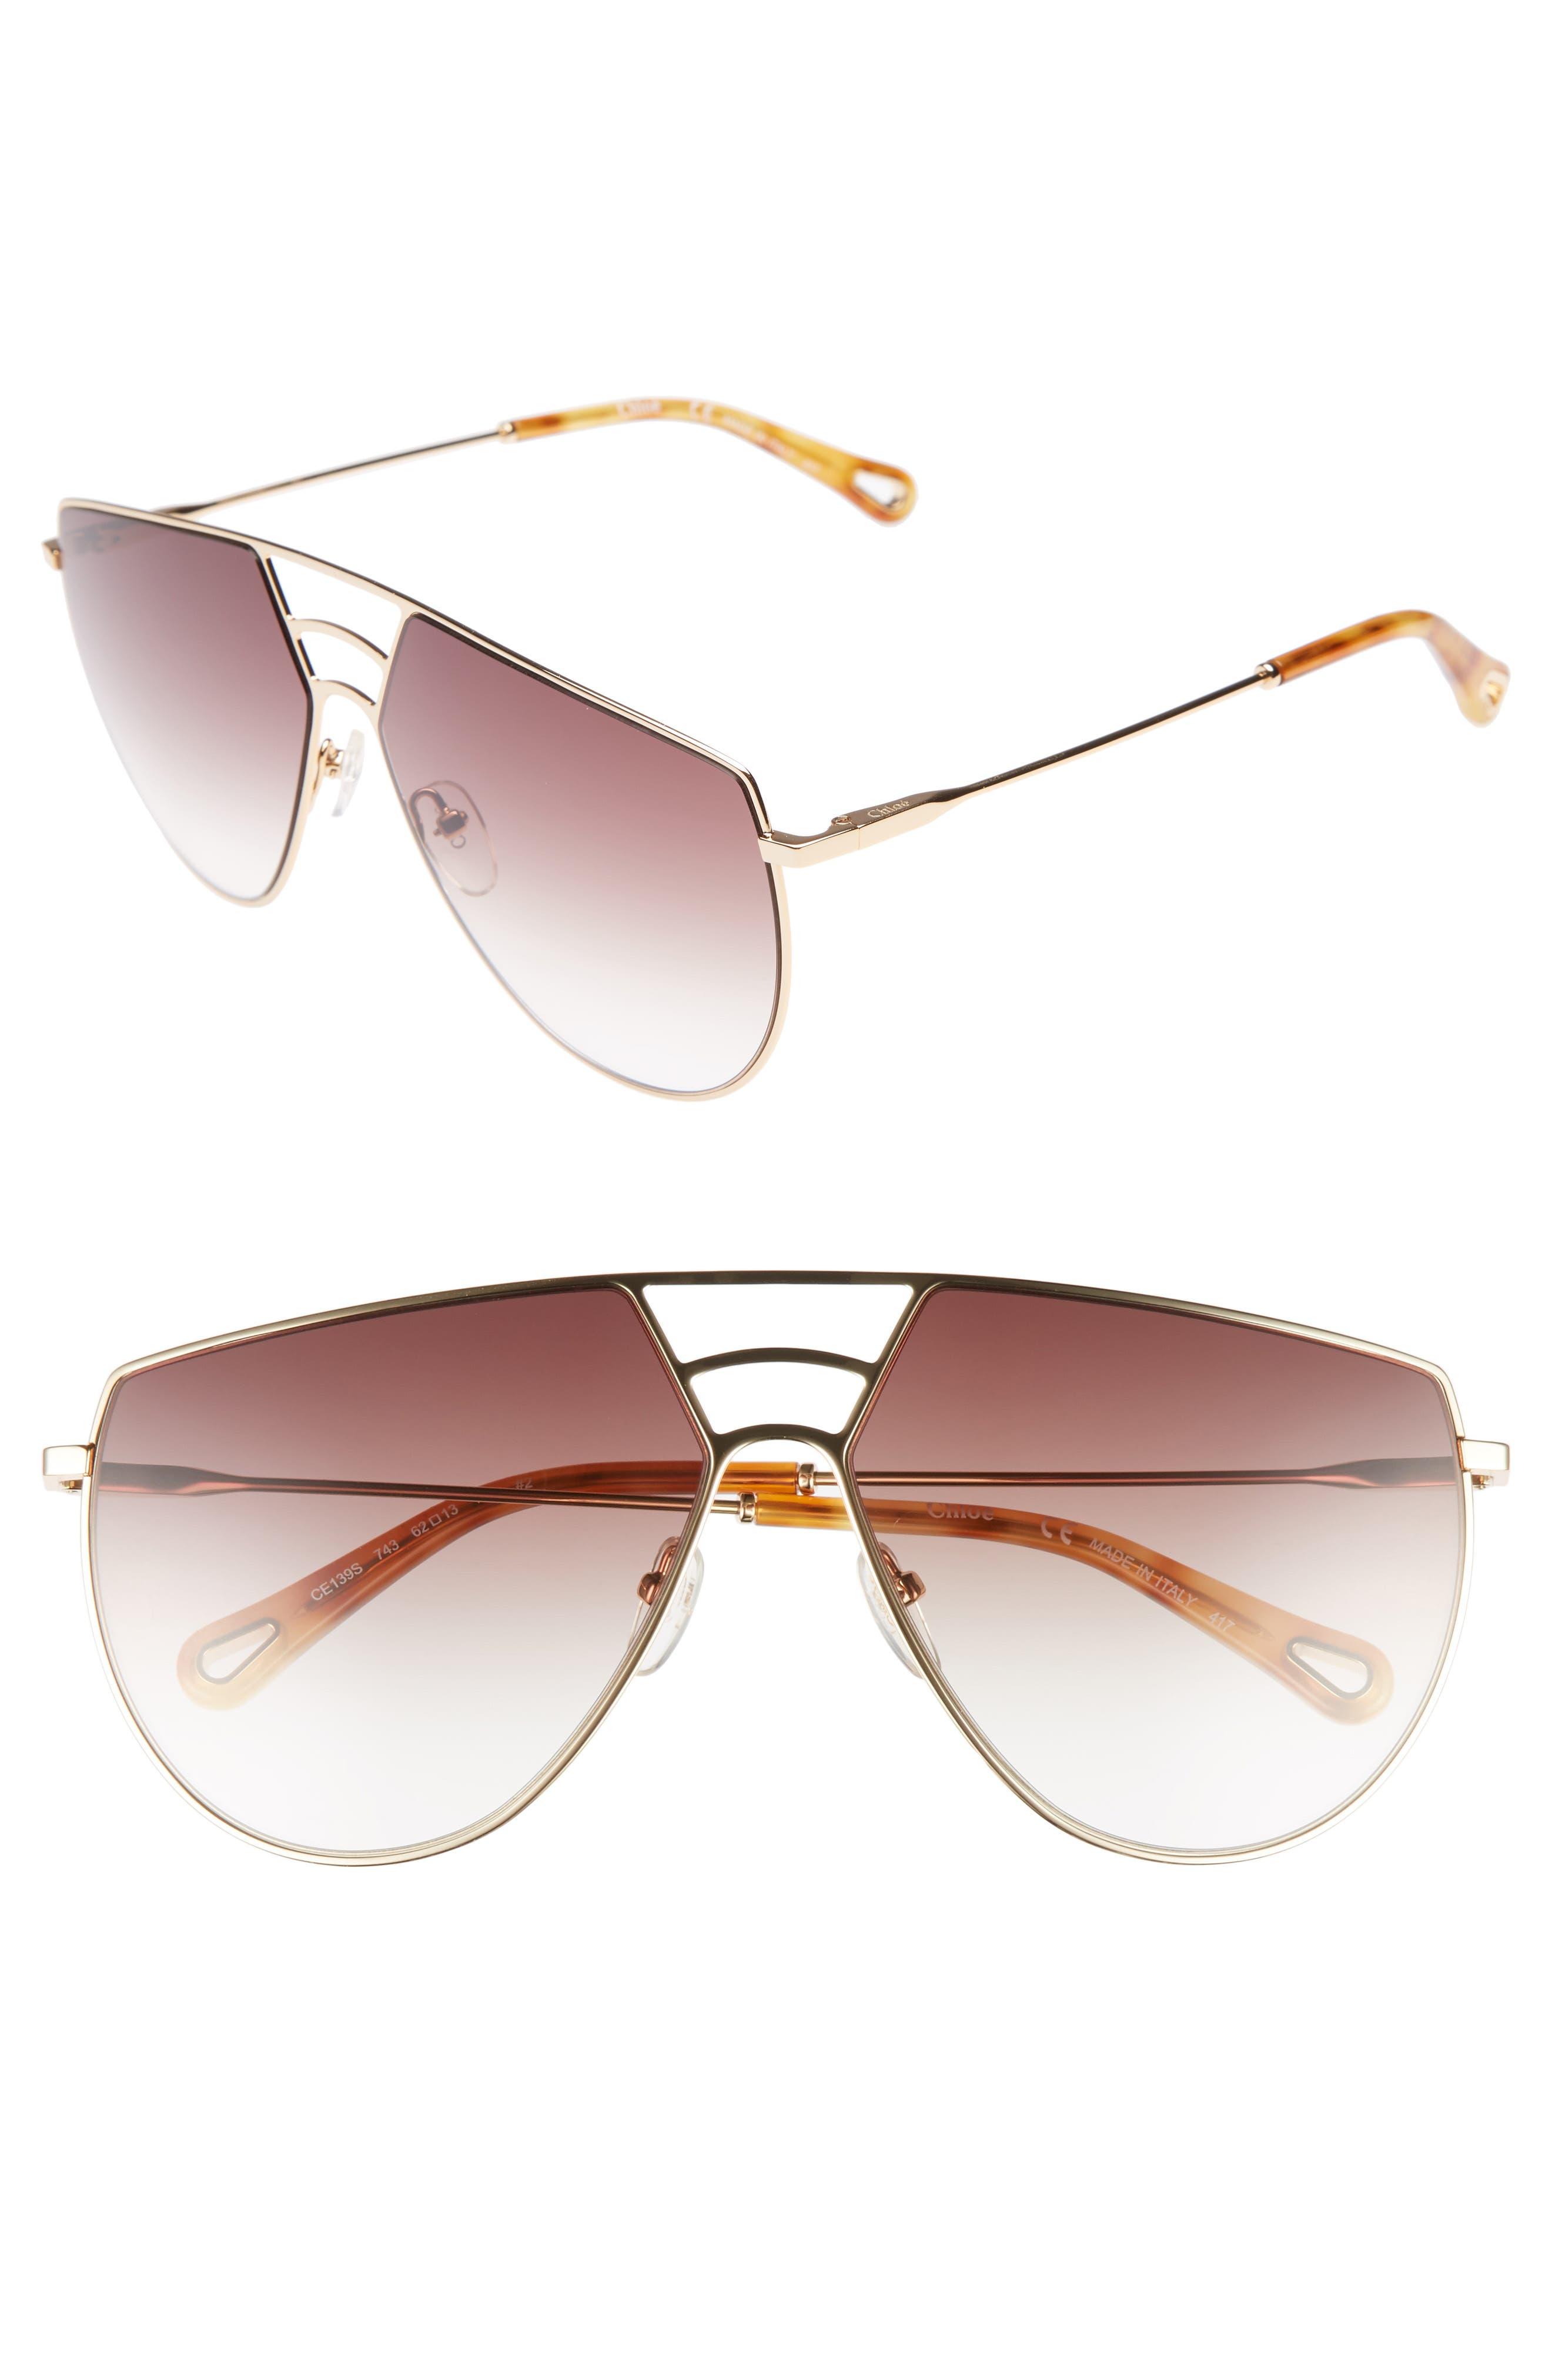 Negative Space 62mm Oversize Aviator Sunglasses,                         Main,                         color, 710